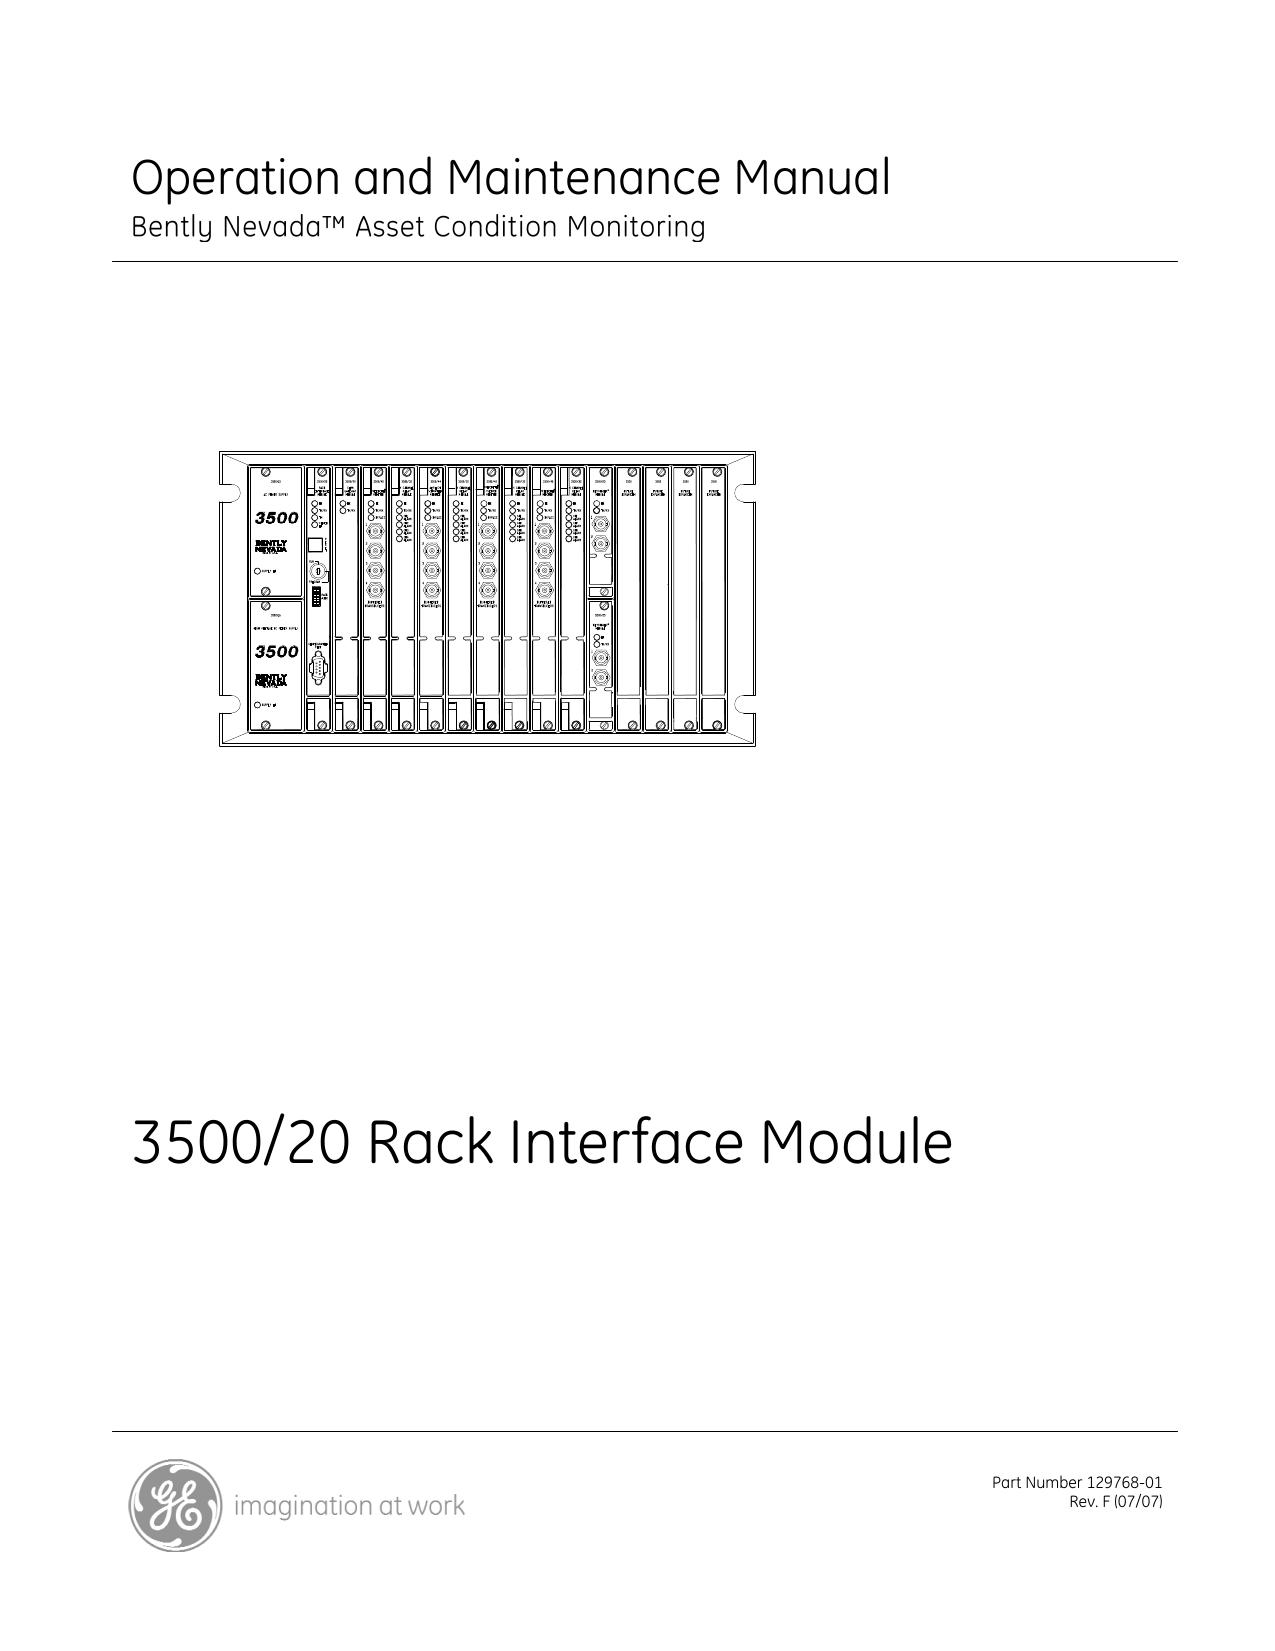 3500/20 rack interface module